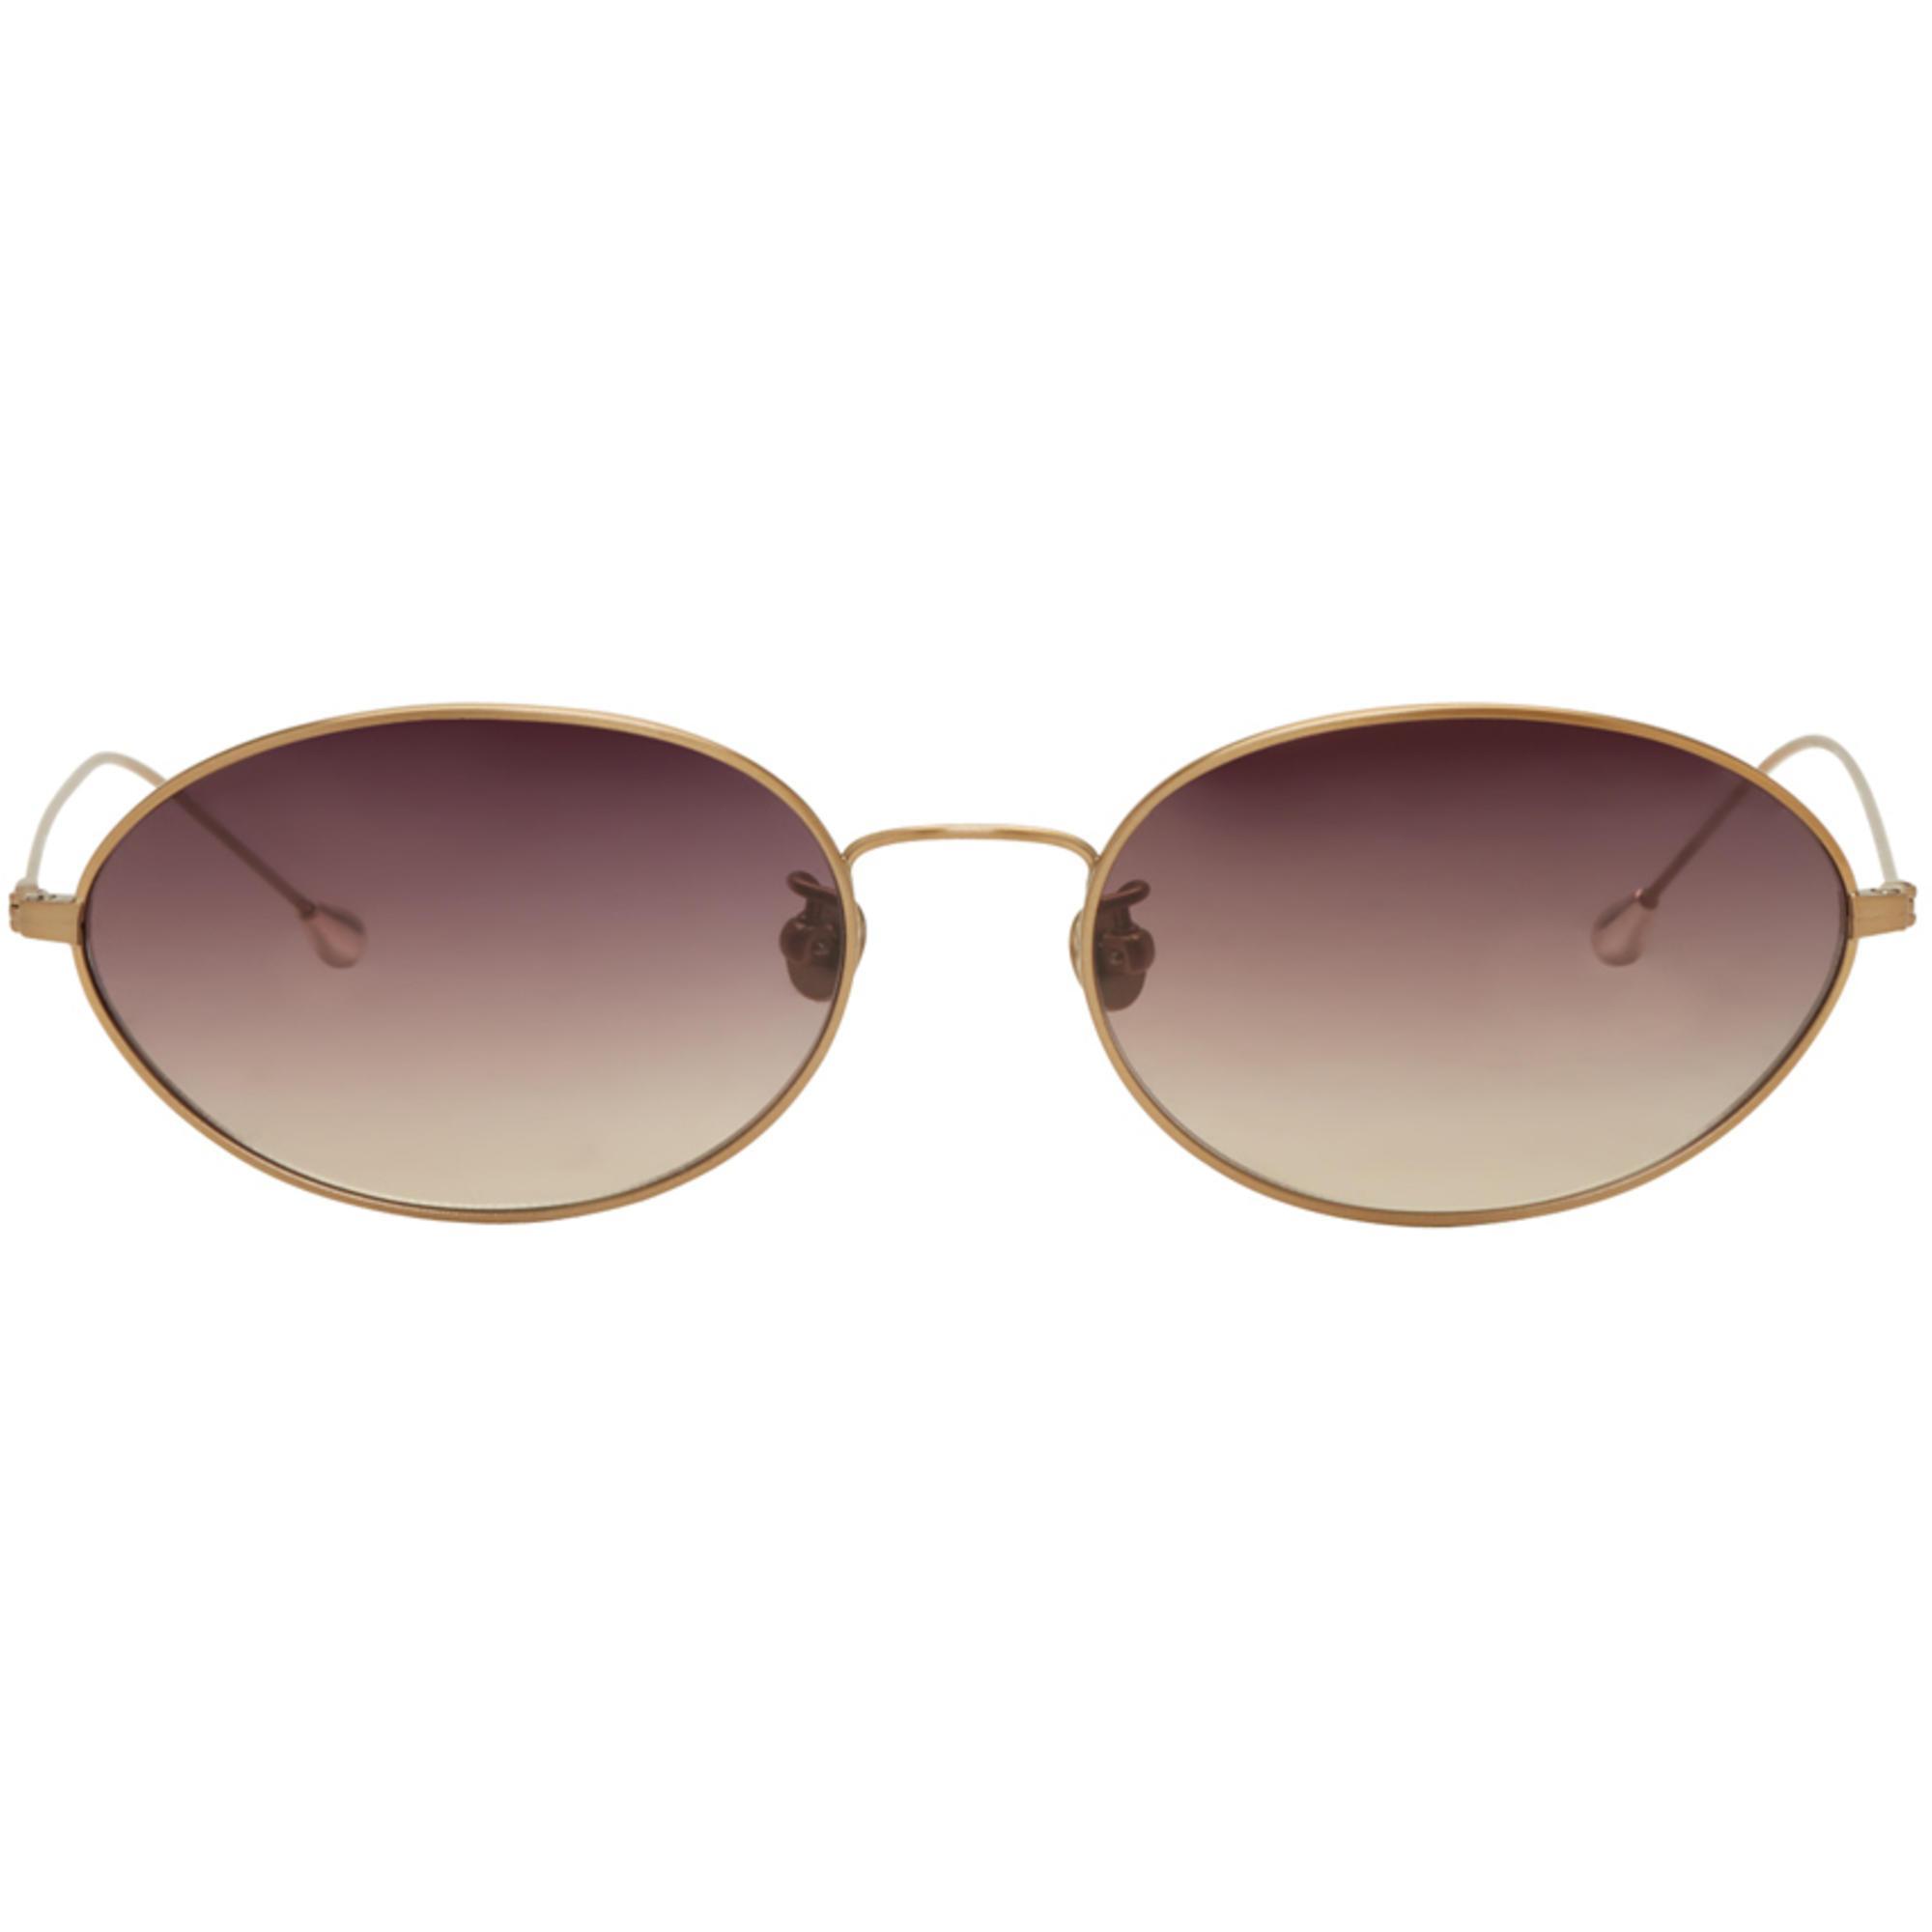 ANN DEMEULEMEESTER Black Linda Farrow Edition Oval Sunglasses UnYQ4F